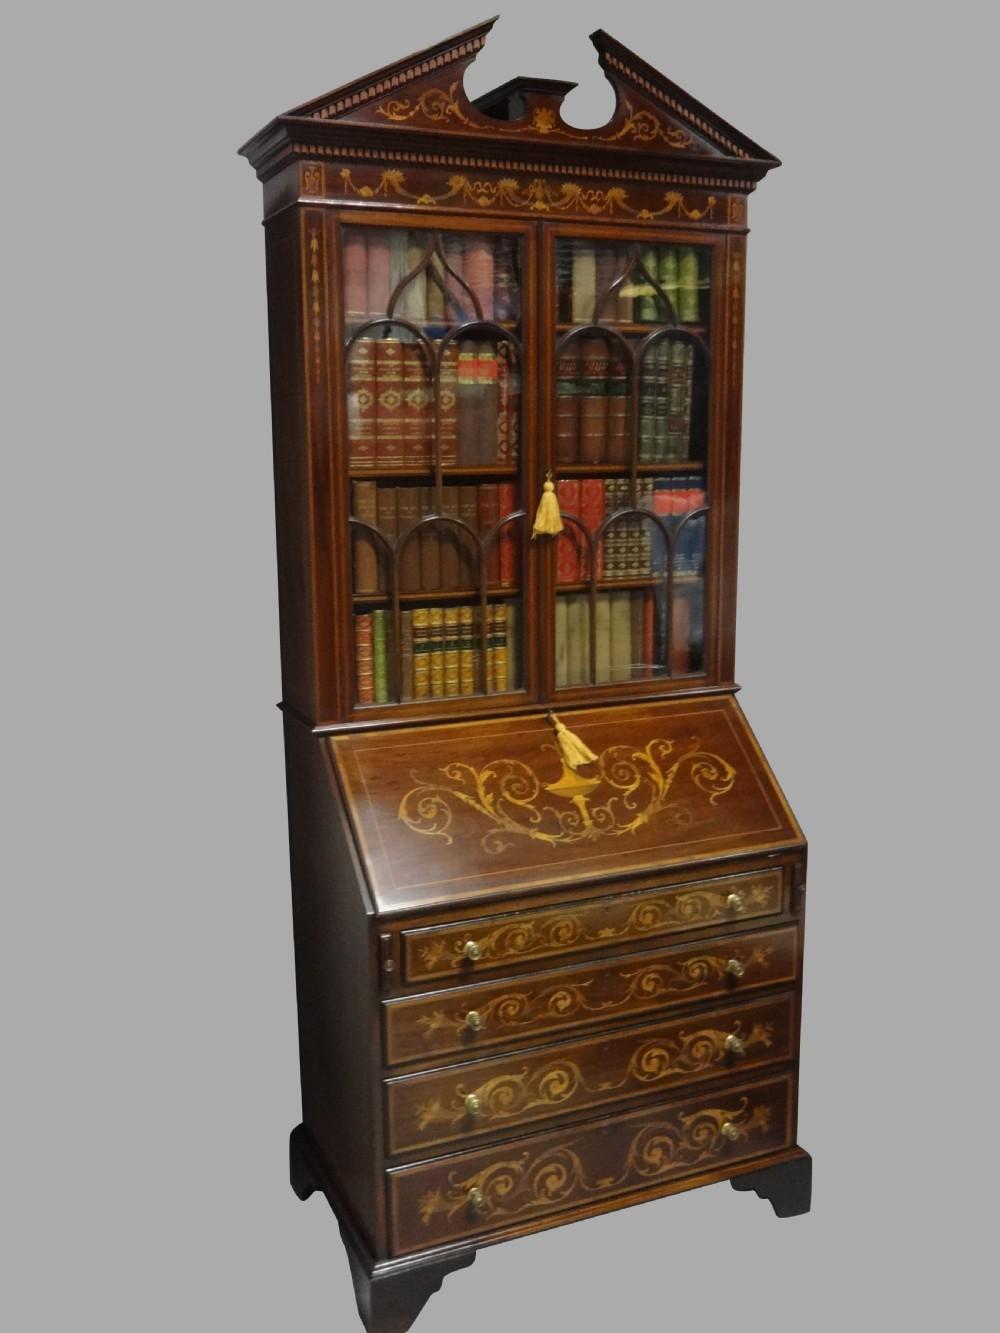 outstanding inlaid mahogany bureau bookcase